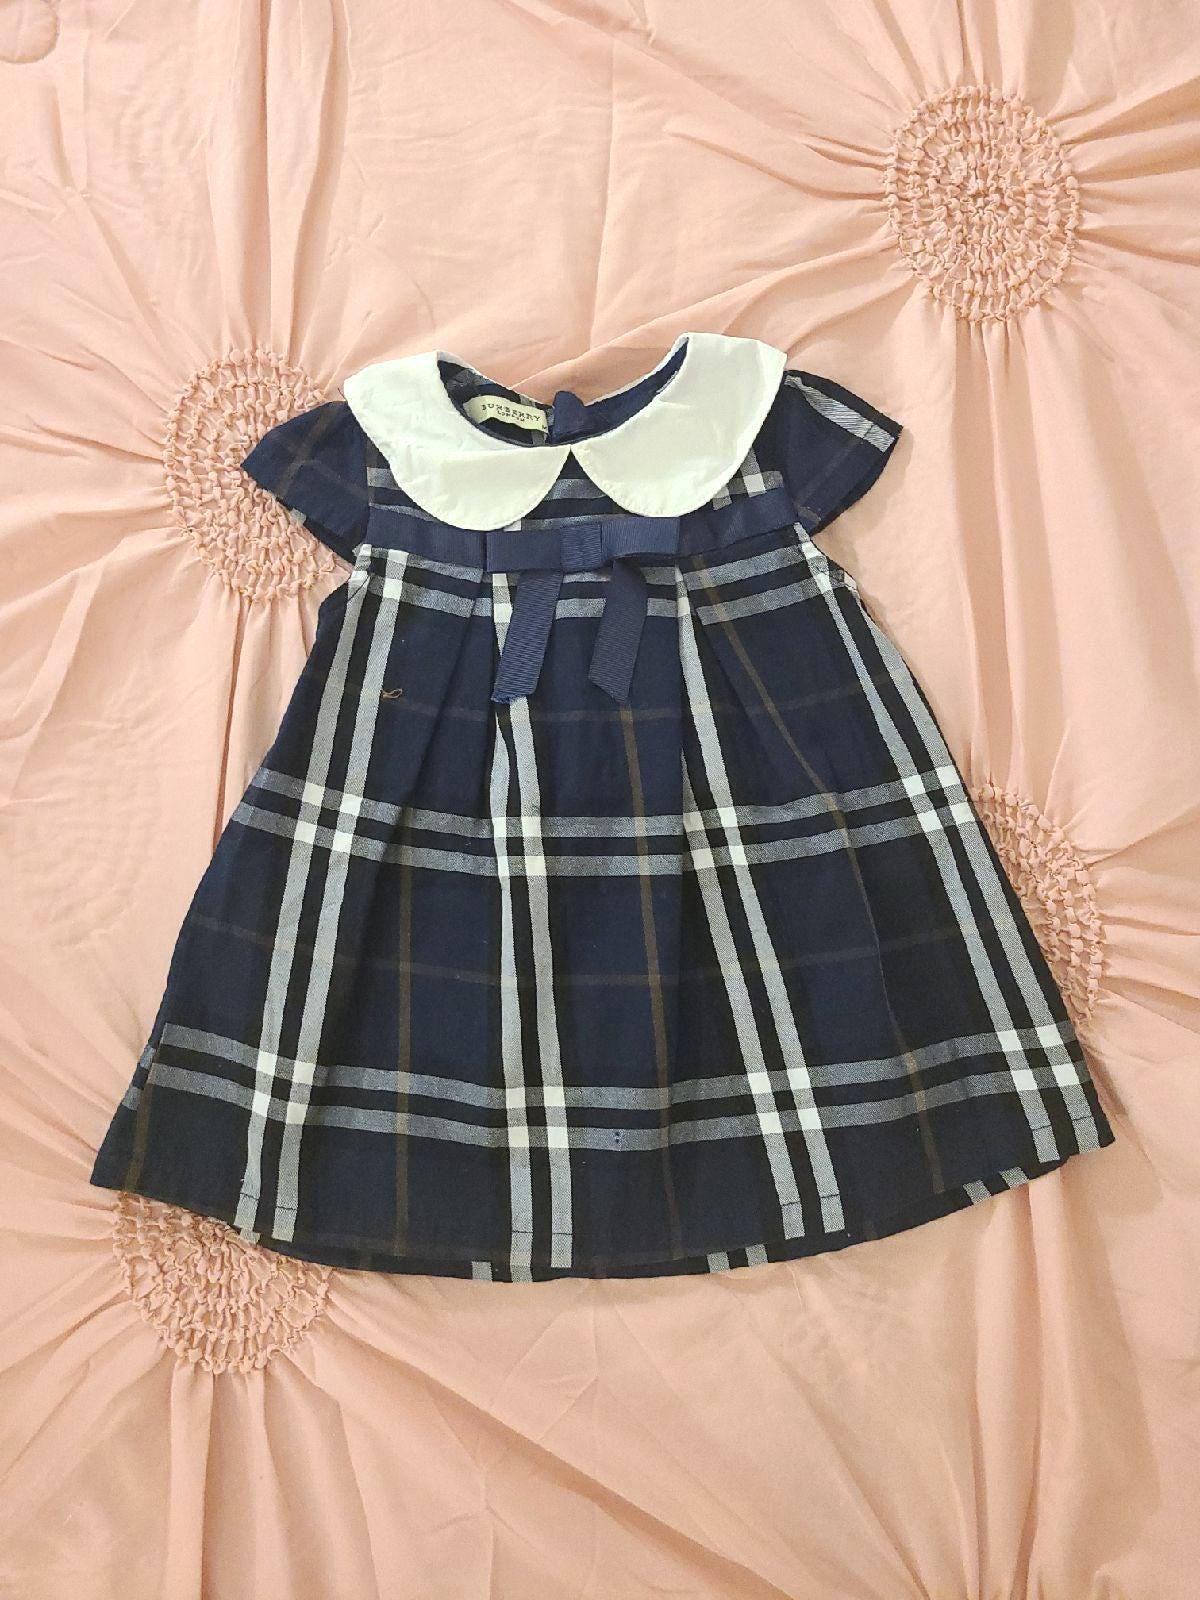 Burberry Blue Plaid Baby Girls Dress